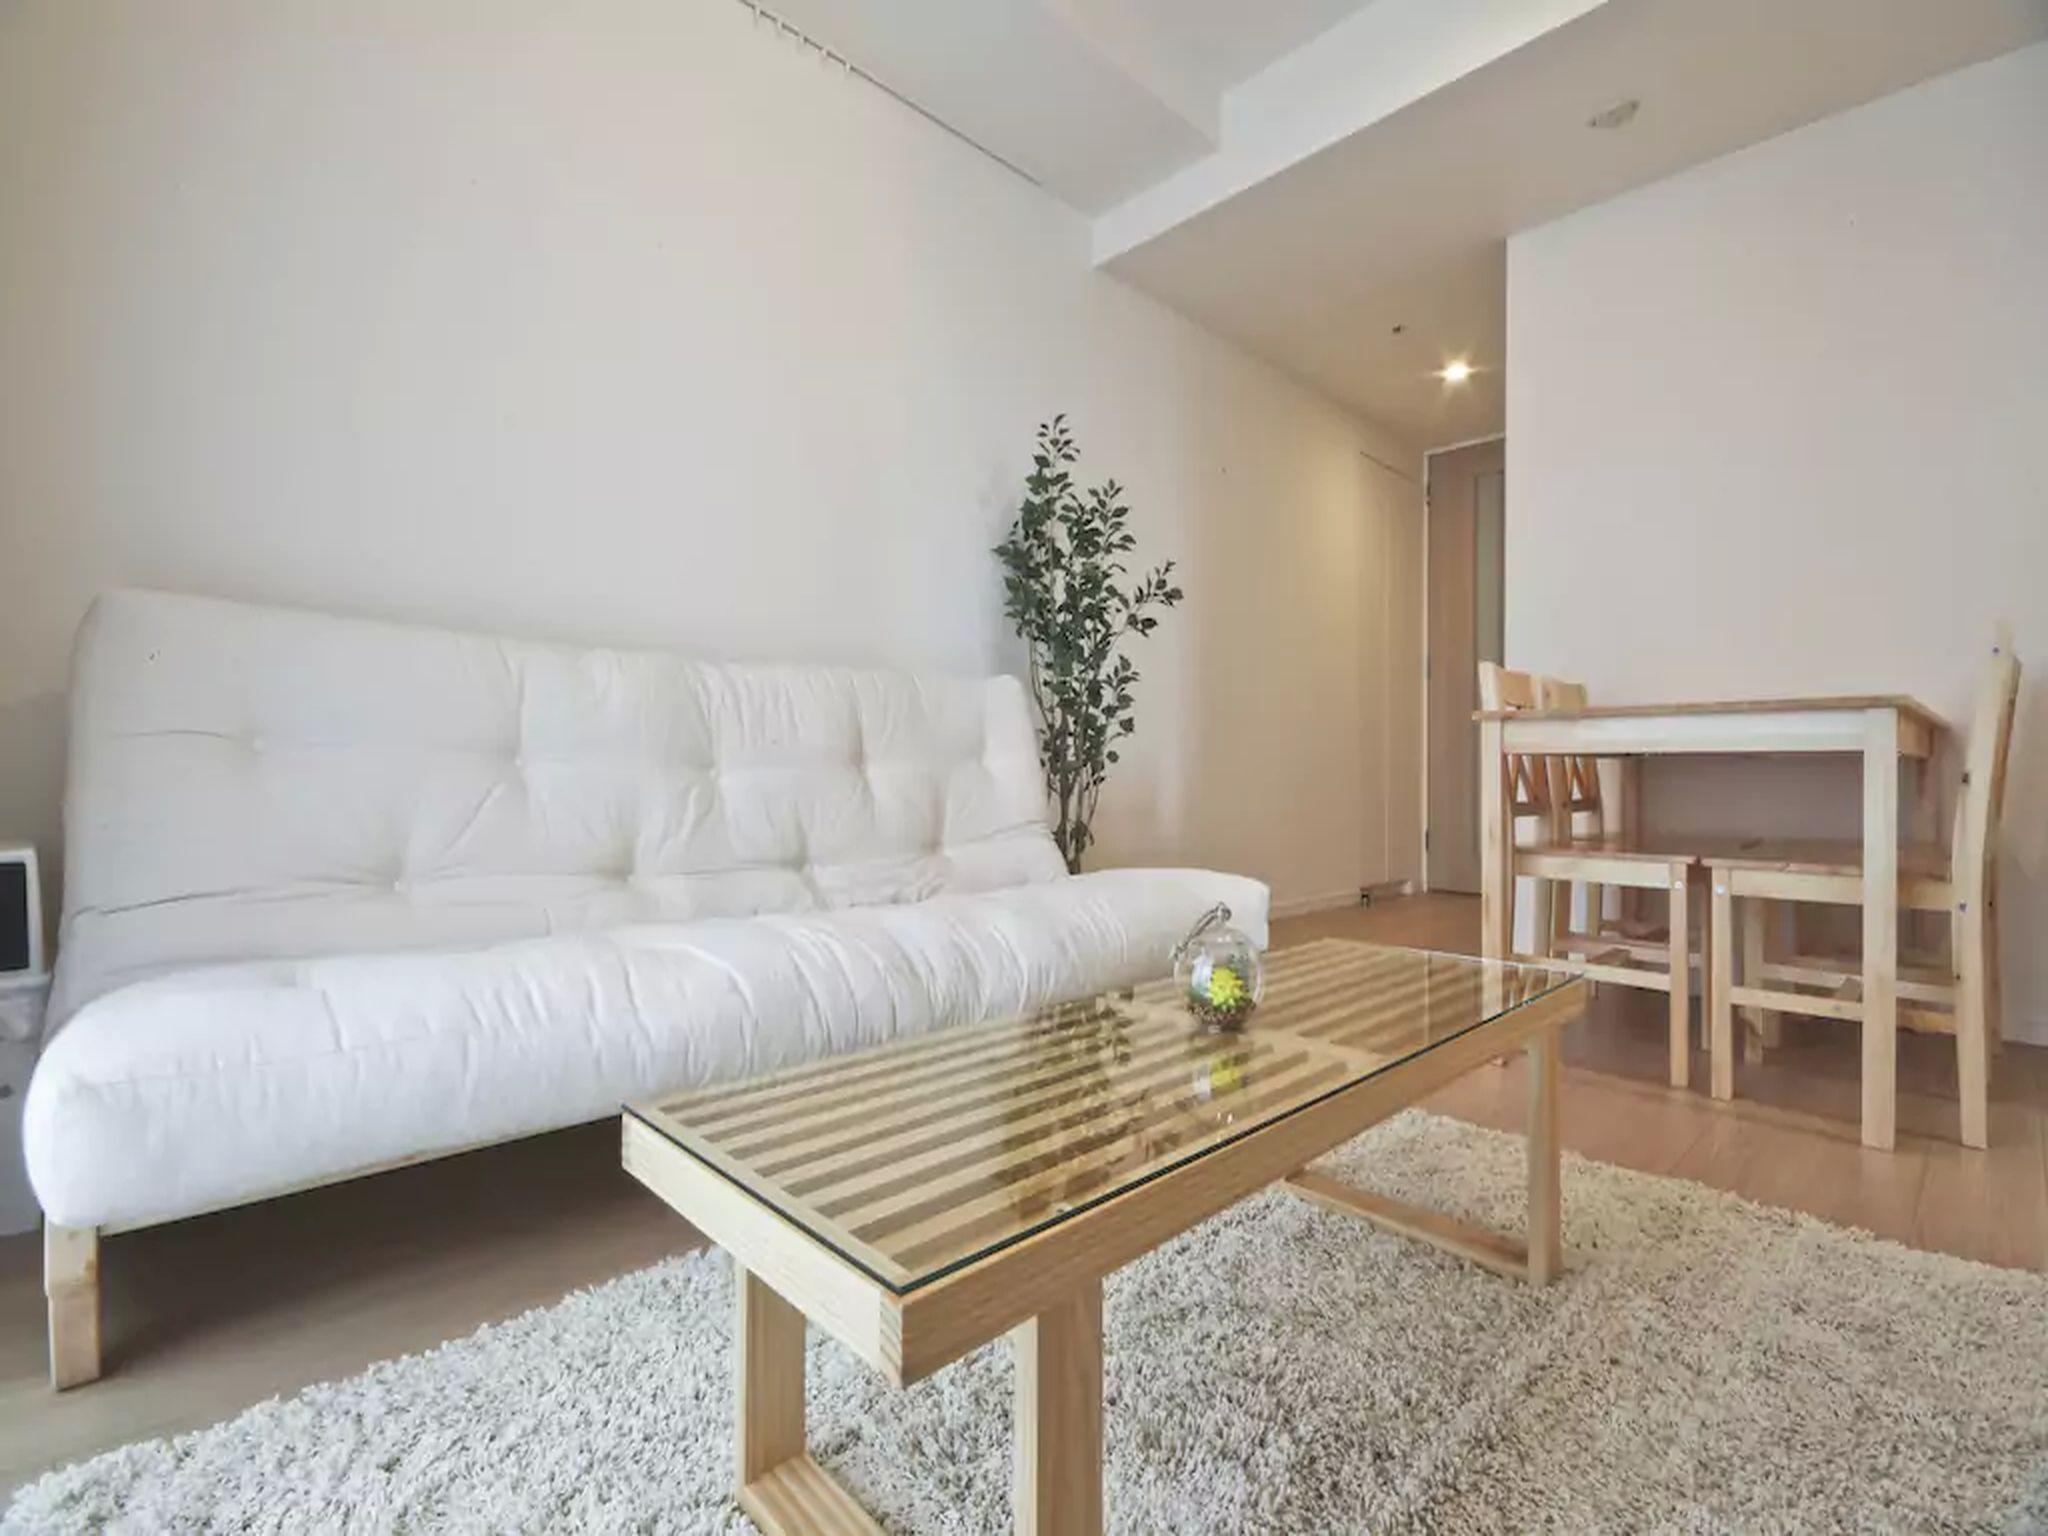 BG New White Room-Latest Facility-Shibuya 6min, Shinagawa